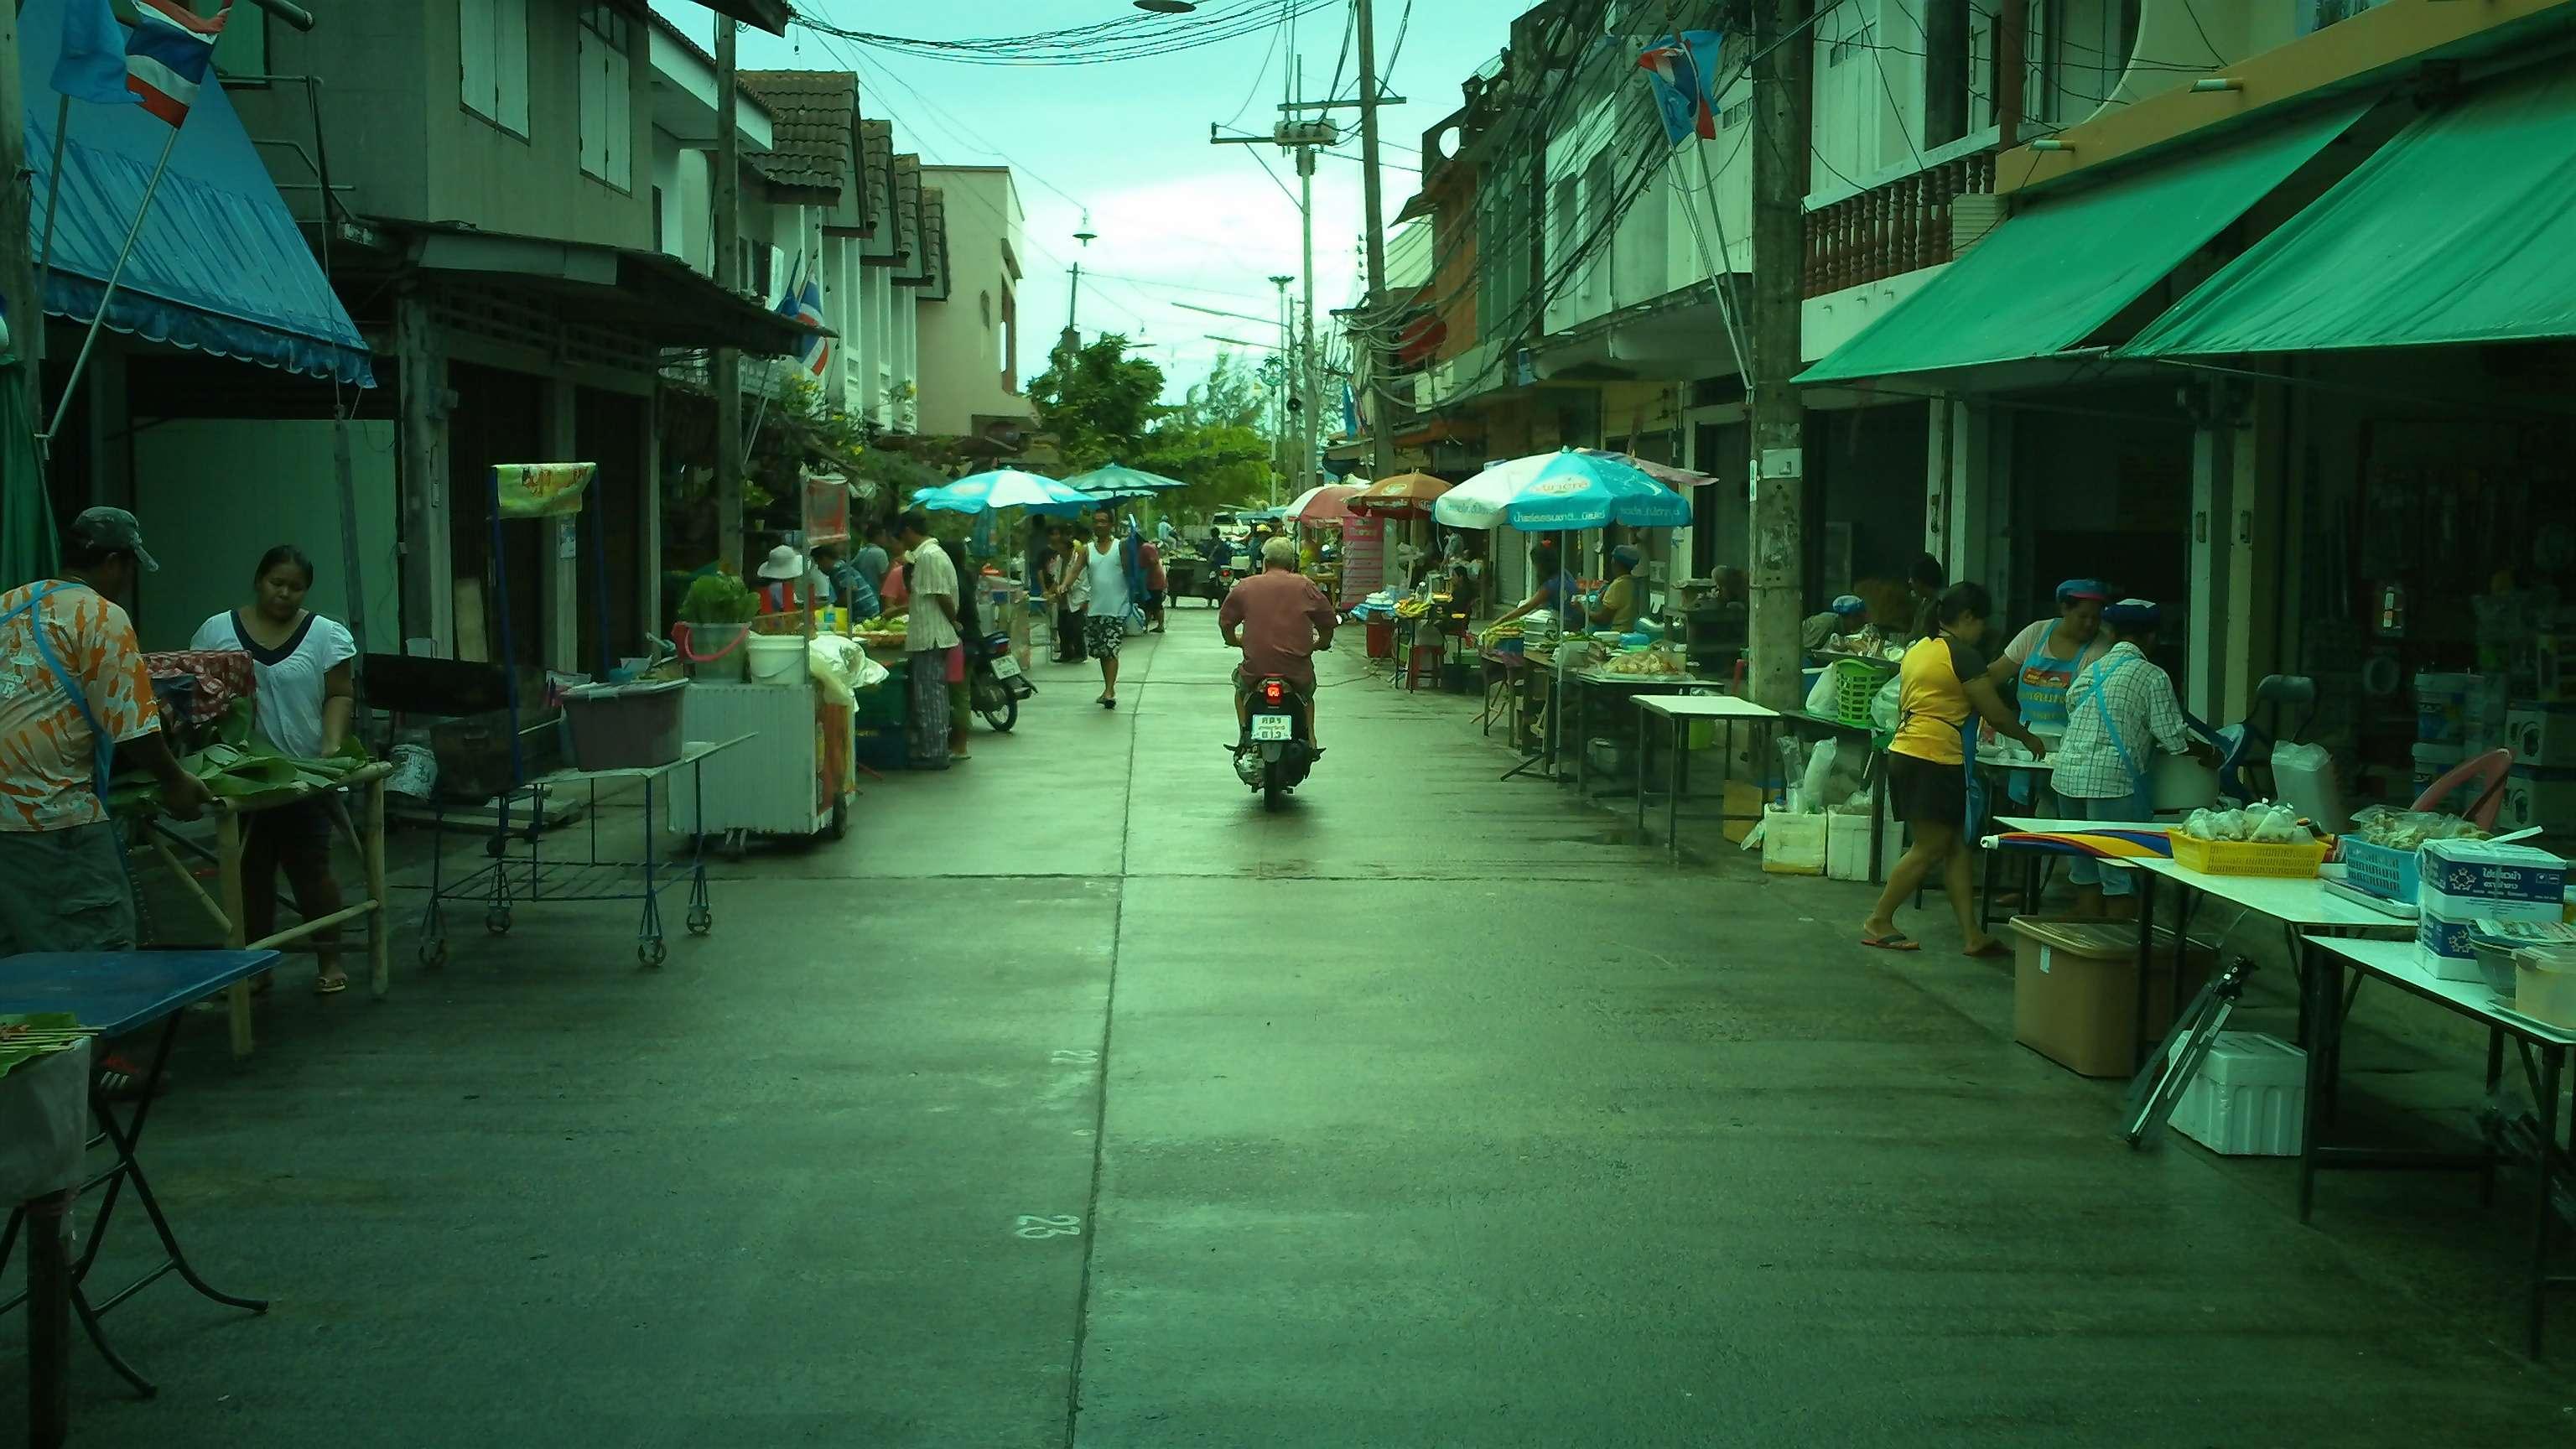 Marktstraße in Thongsala